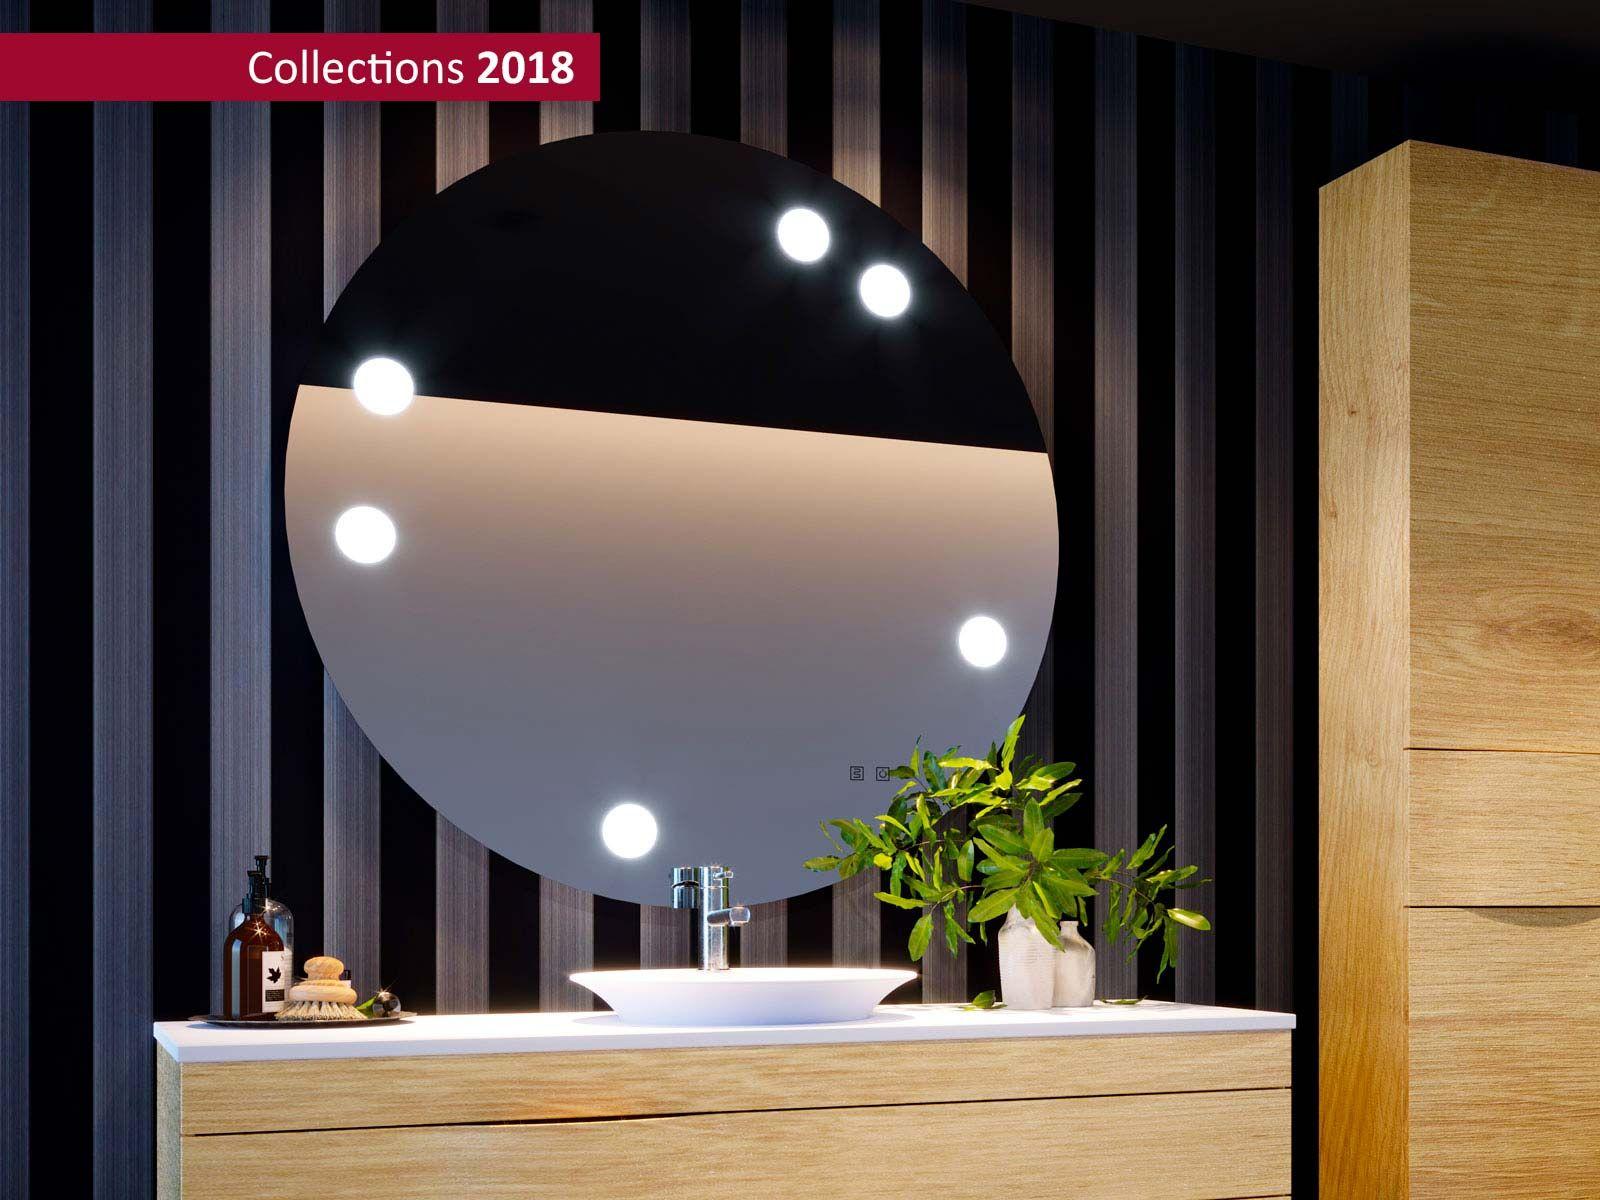 27+ Miroir salle de bain rond bois ideas